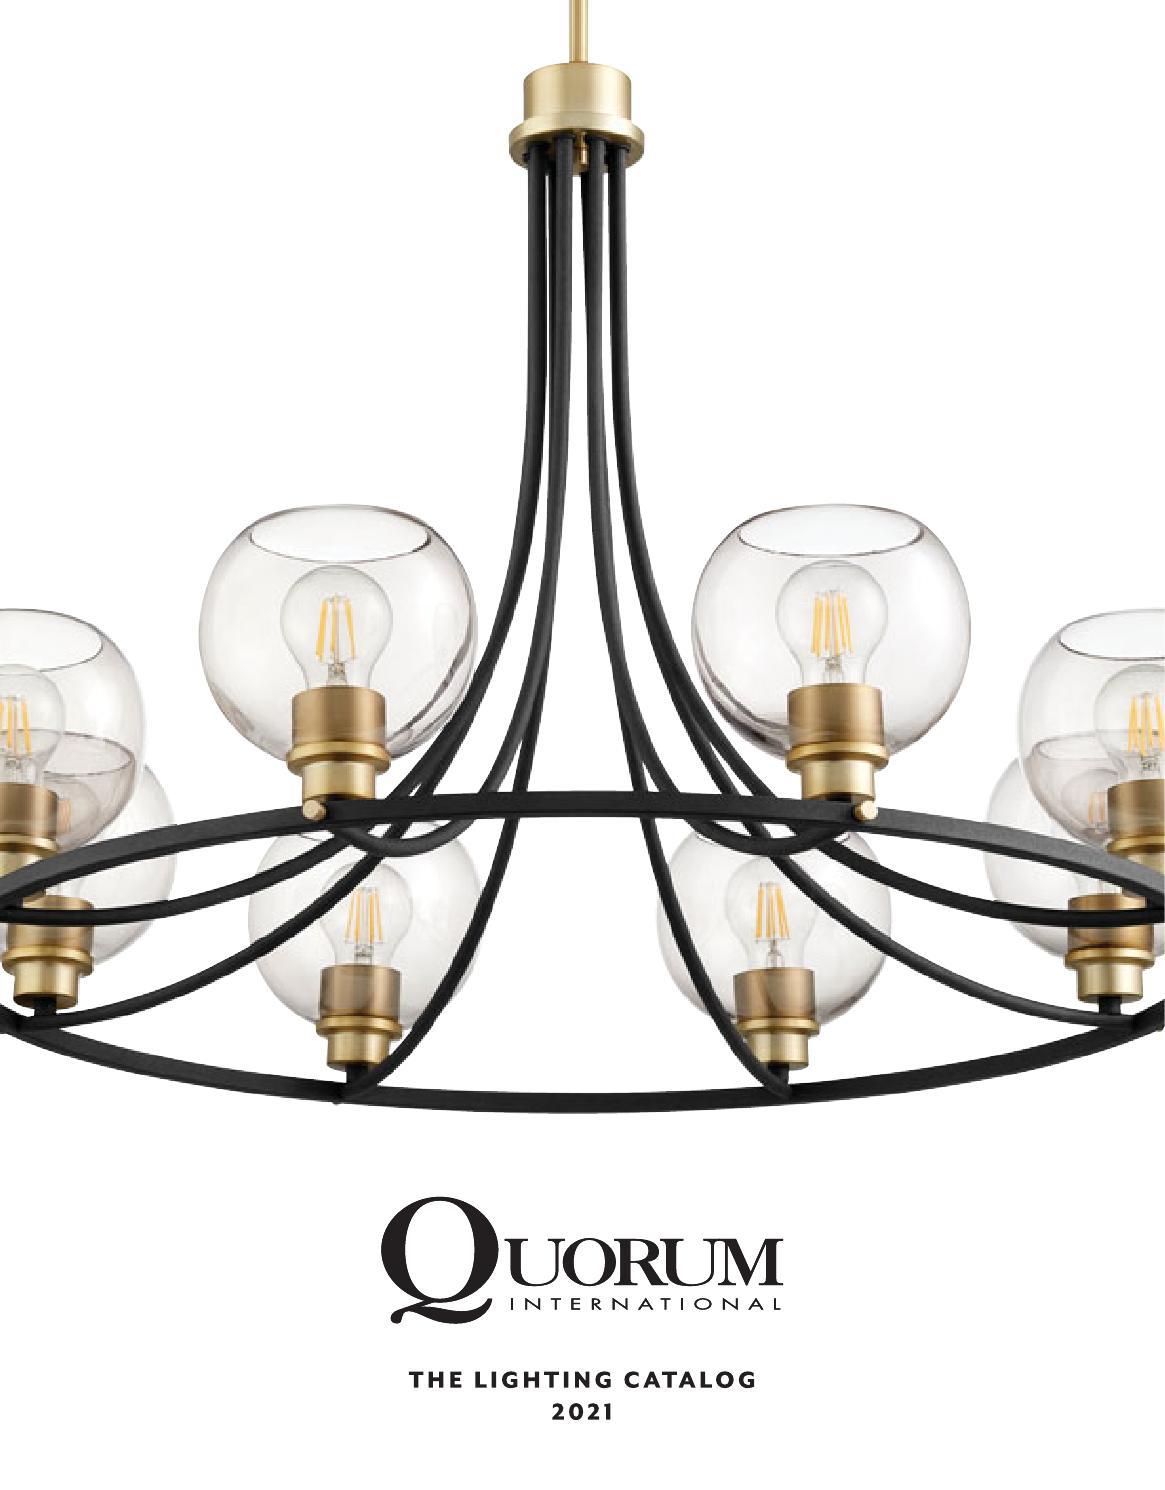 Quorum Lighting Catalog 2021 By Tfg Issuu